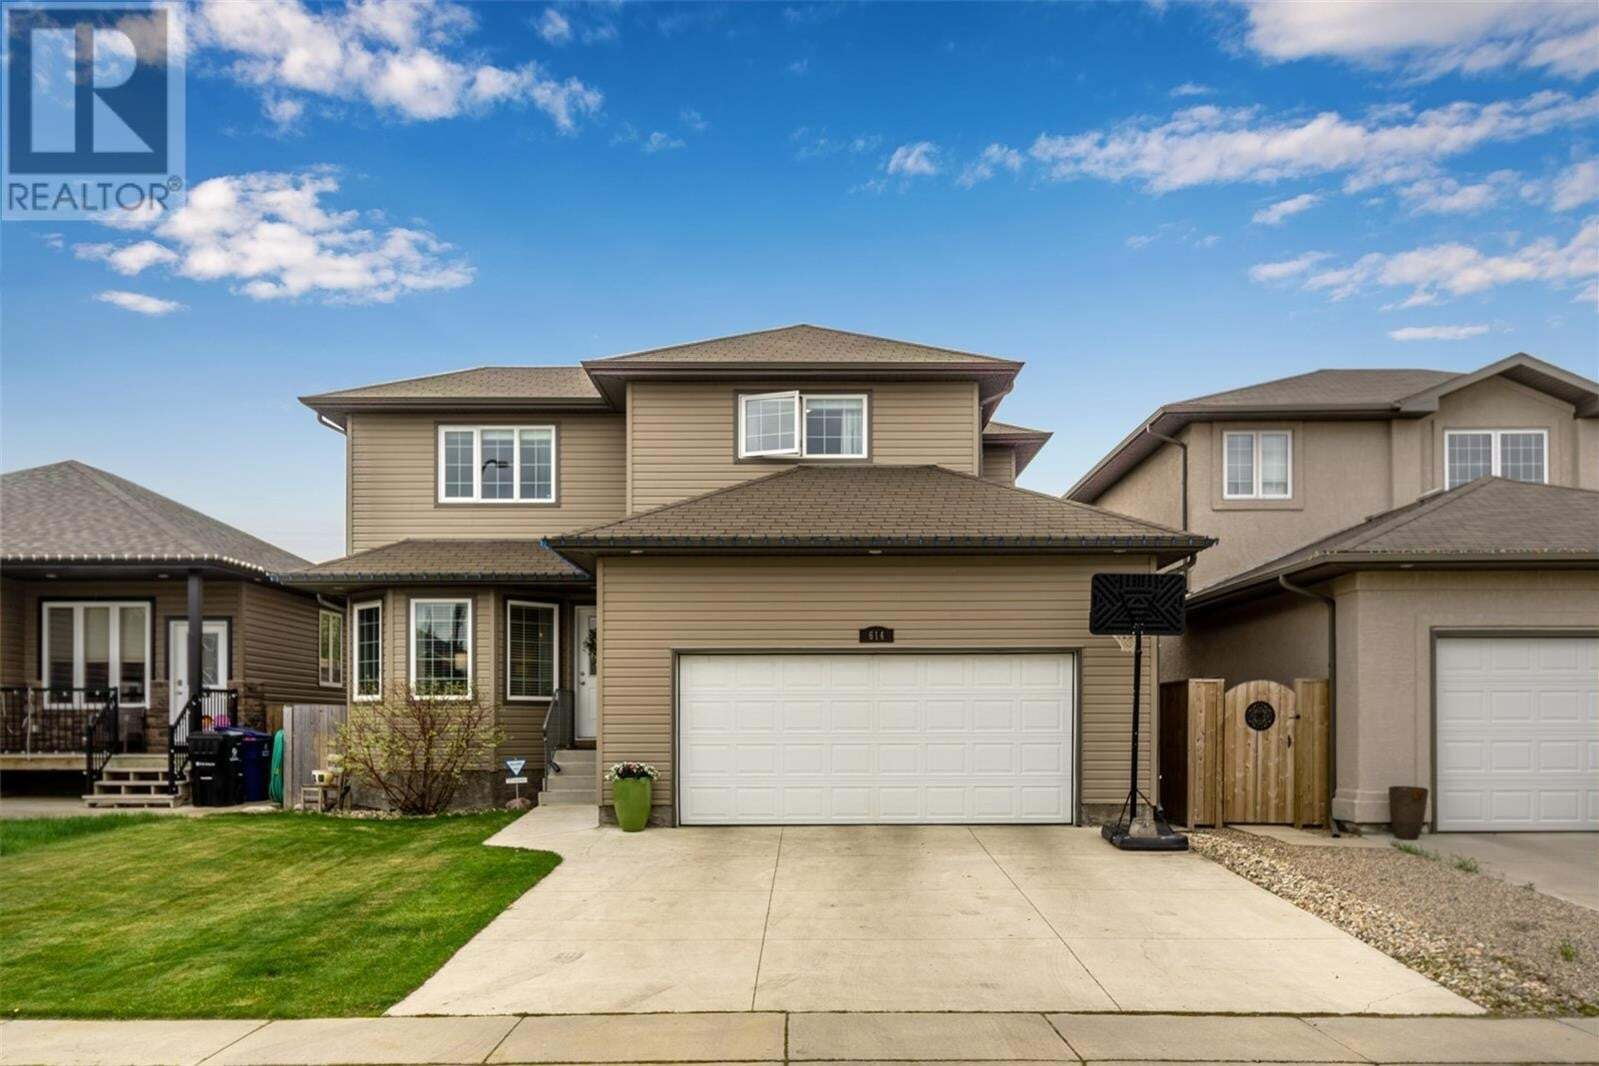 House for sale at 614 Mckague Cres Saskatoon Saskatchewan - MLS: SK810068